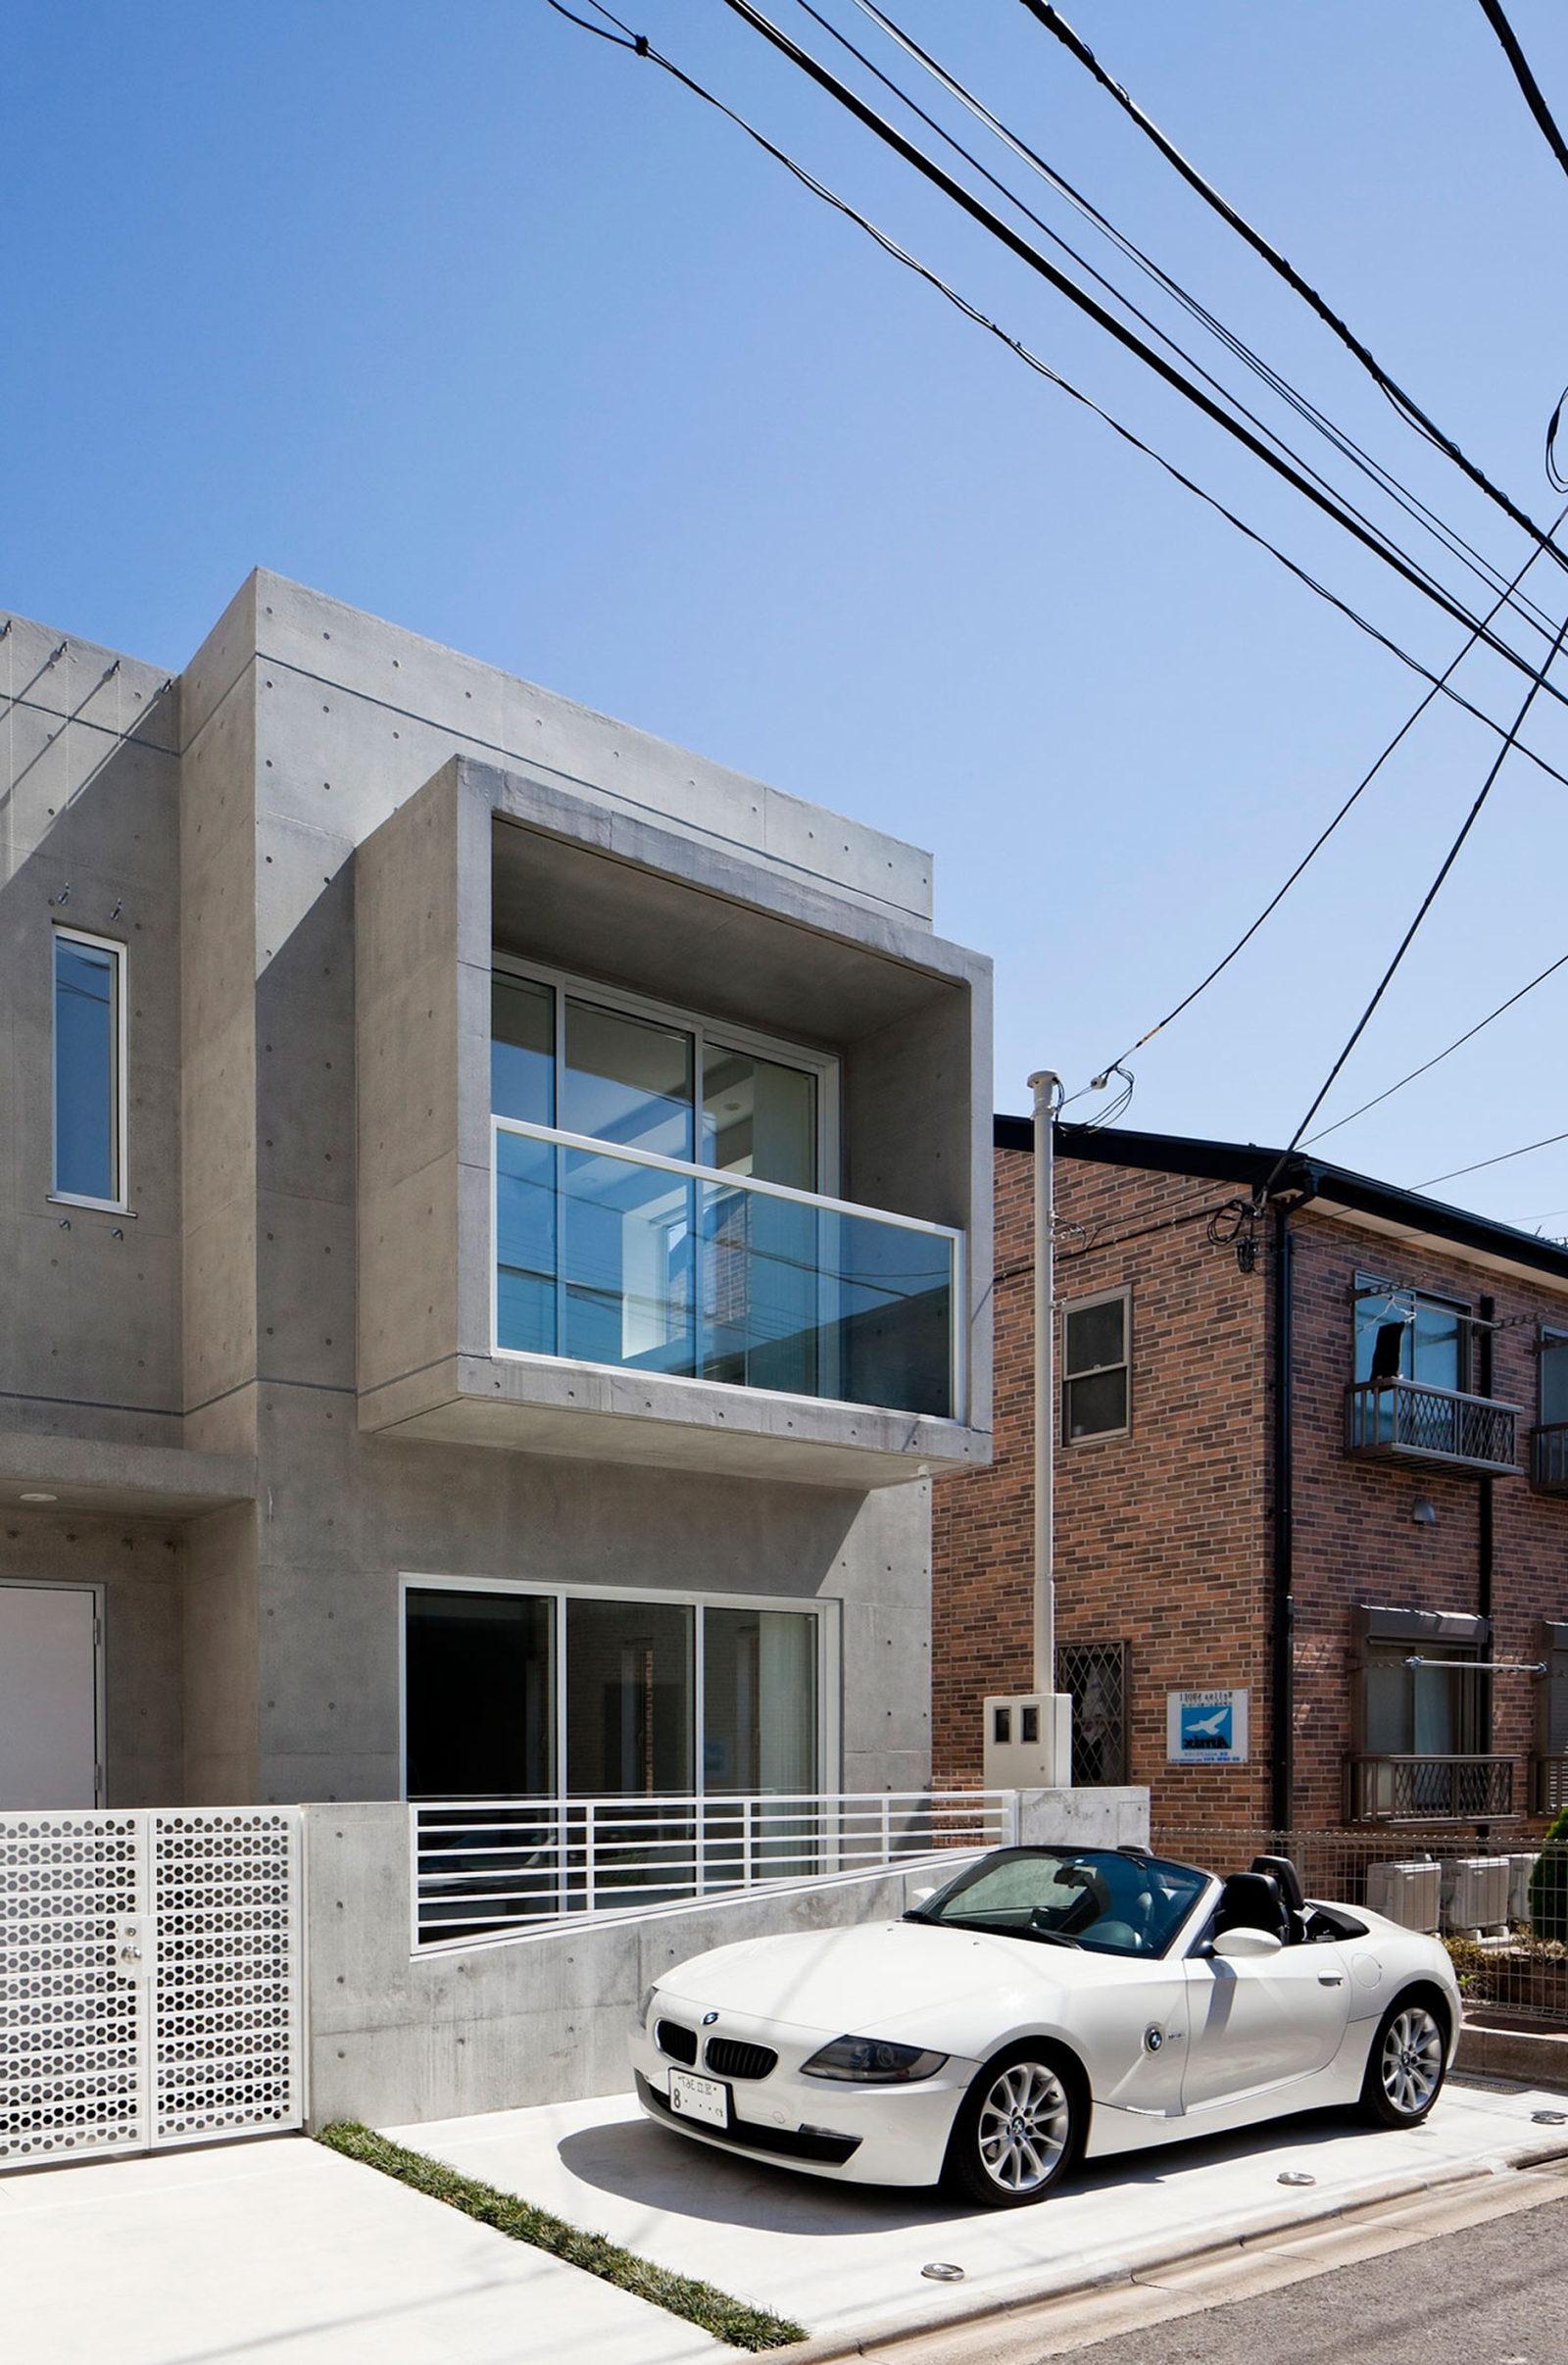 Design house car - Zen House From Rck Design Studio In Japan